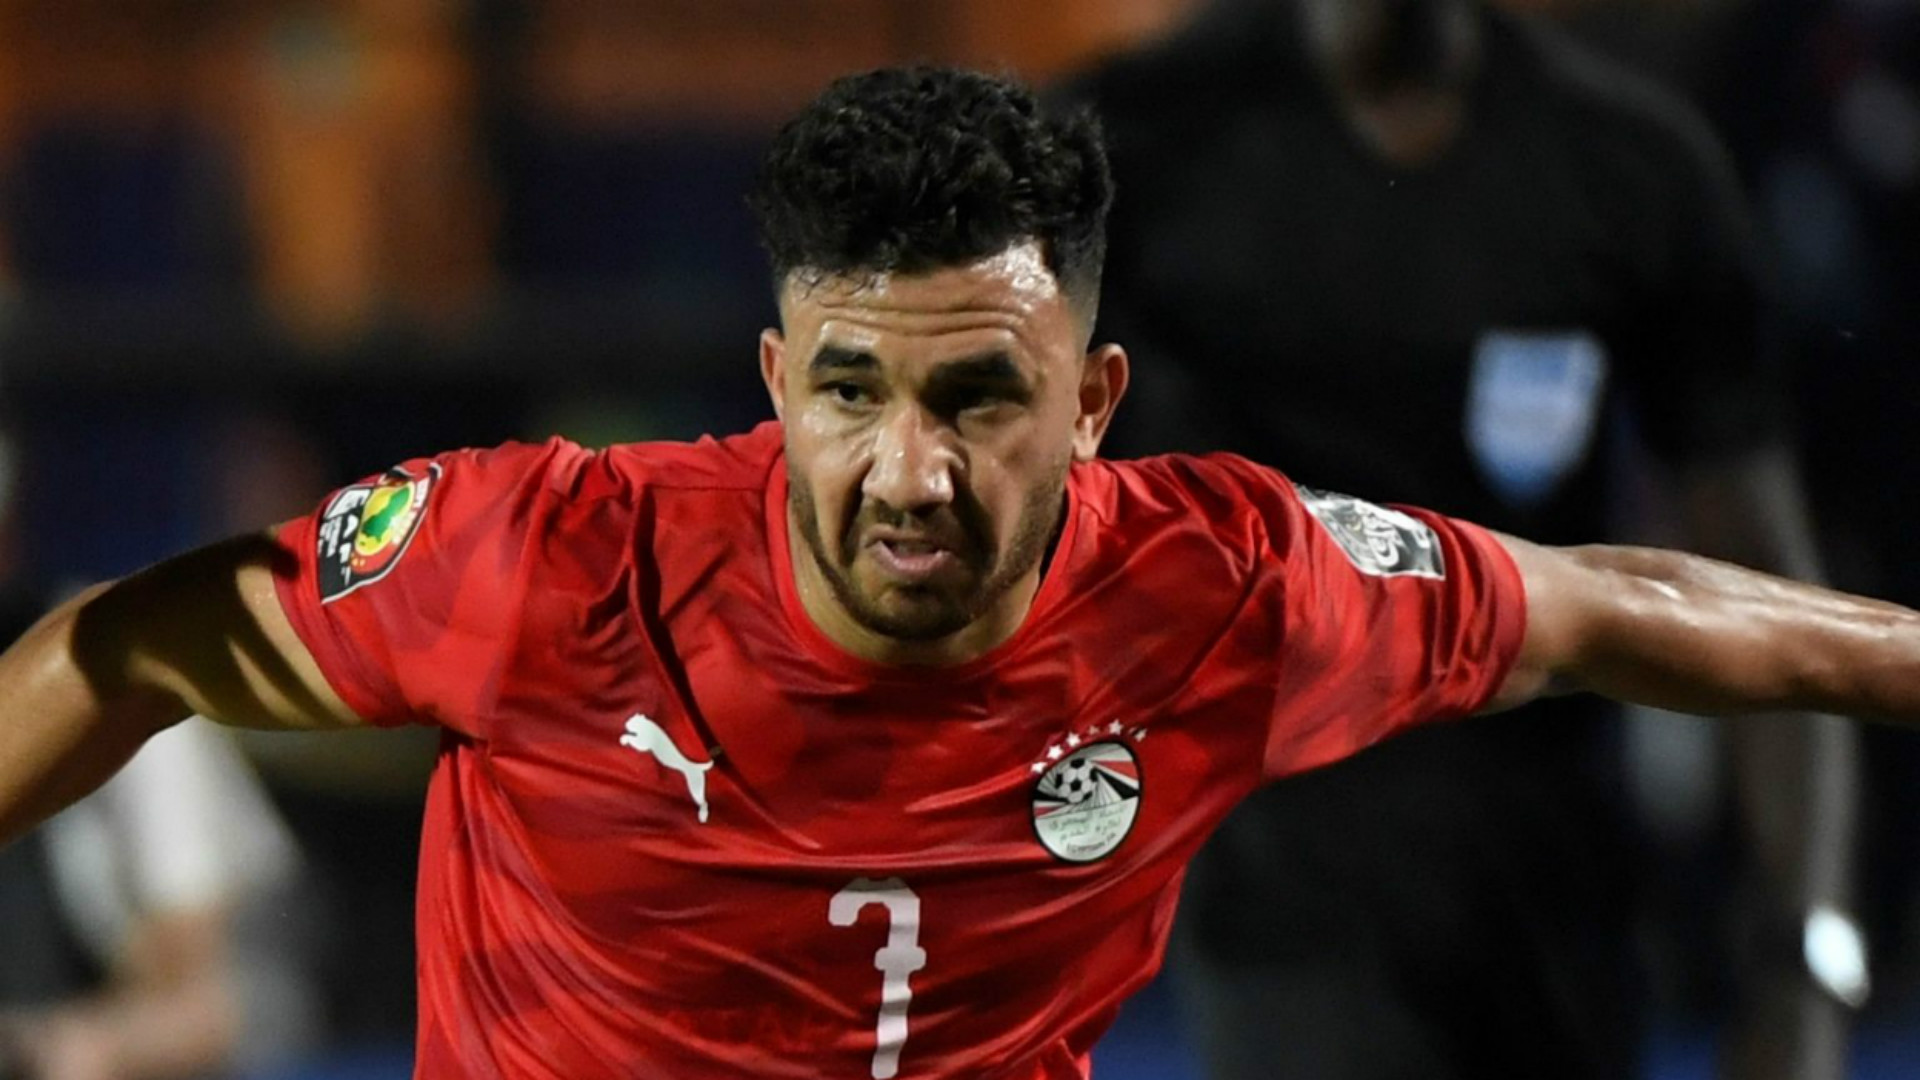 Aston Villa star Trezeguet: Al Ahly mentality shaped me for Europe